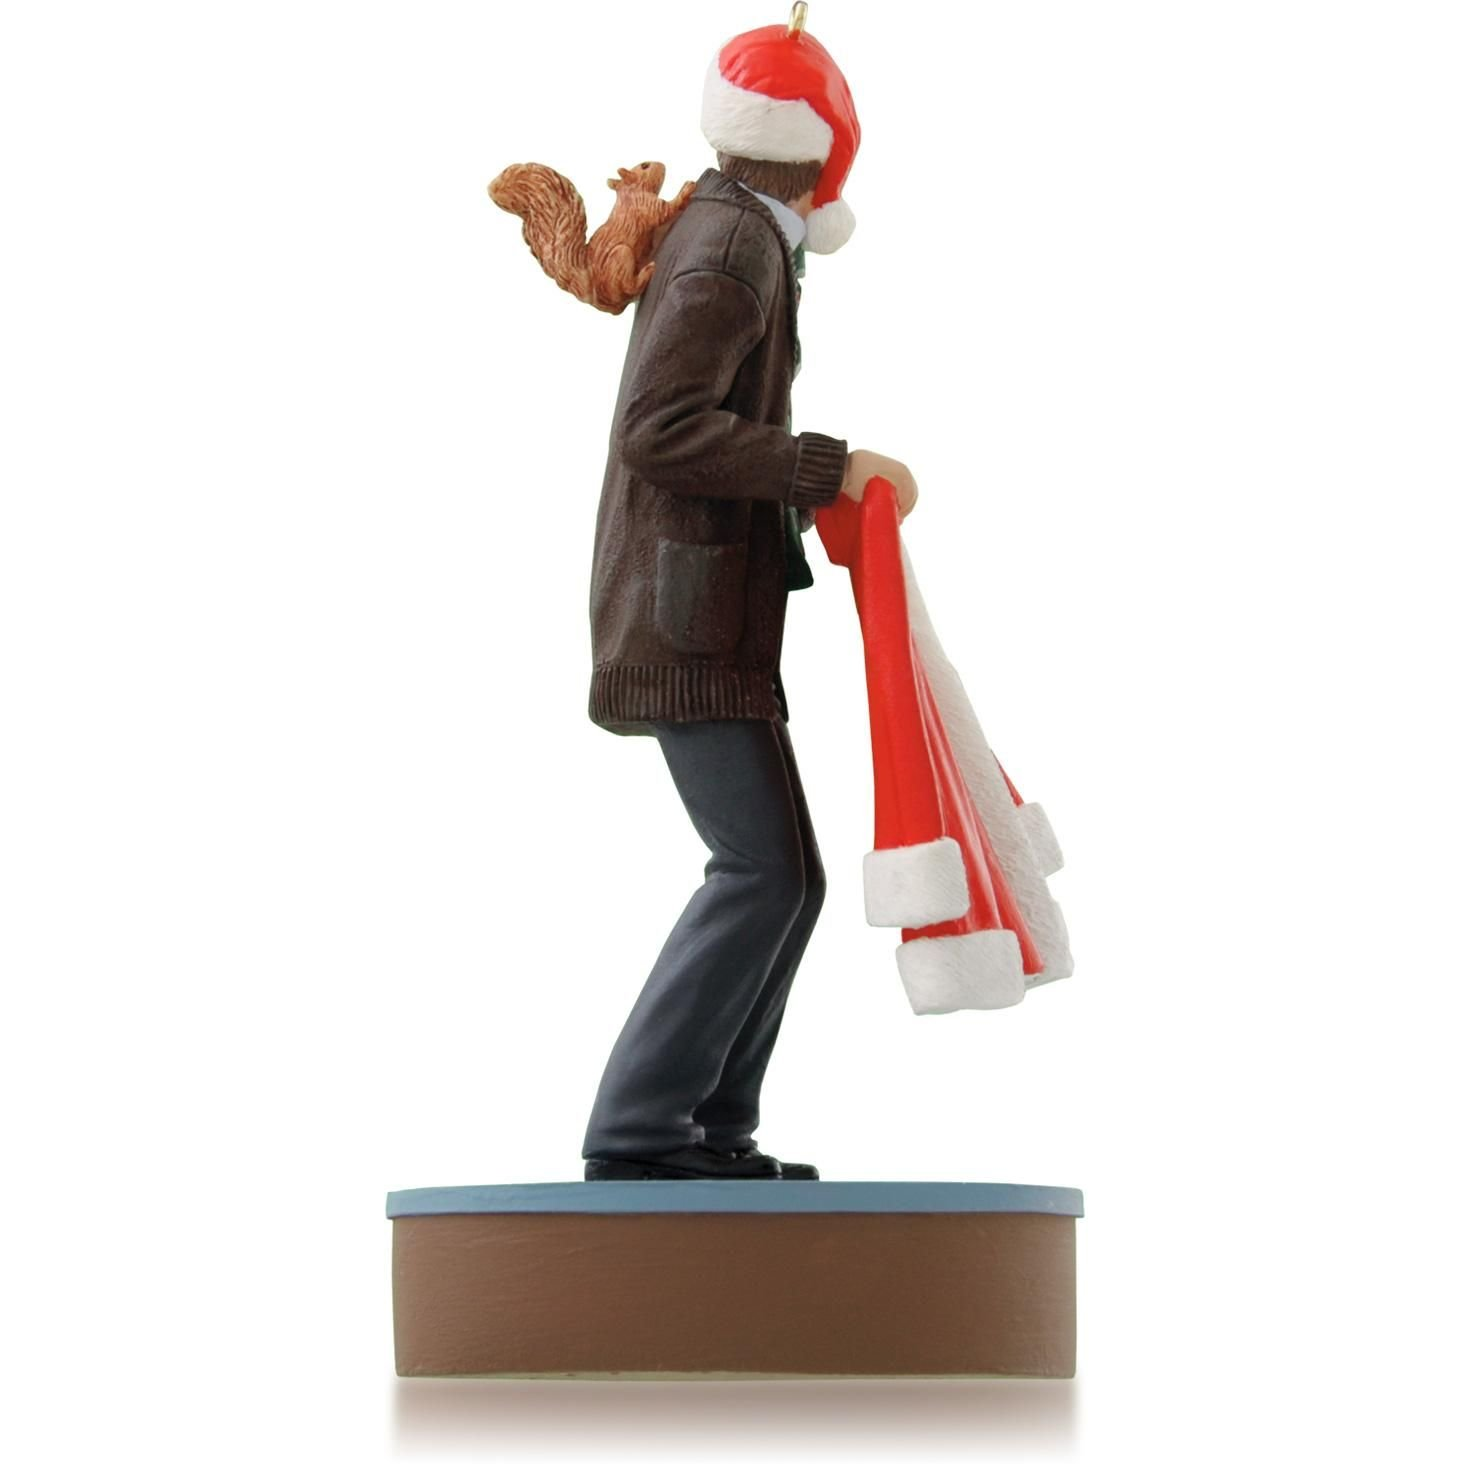 Amazon: Hallmark 2014 Squirrel National Lampoon's Christmas Vacation  Ornament: Home & Kitchen